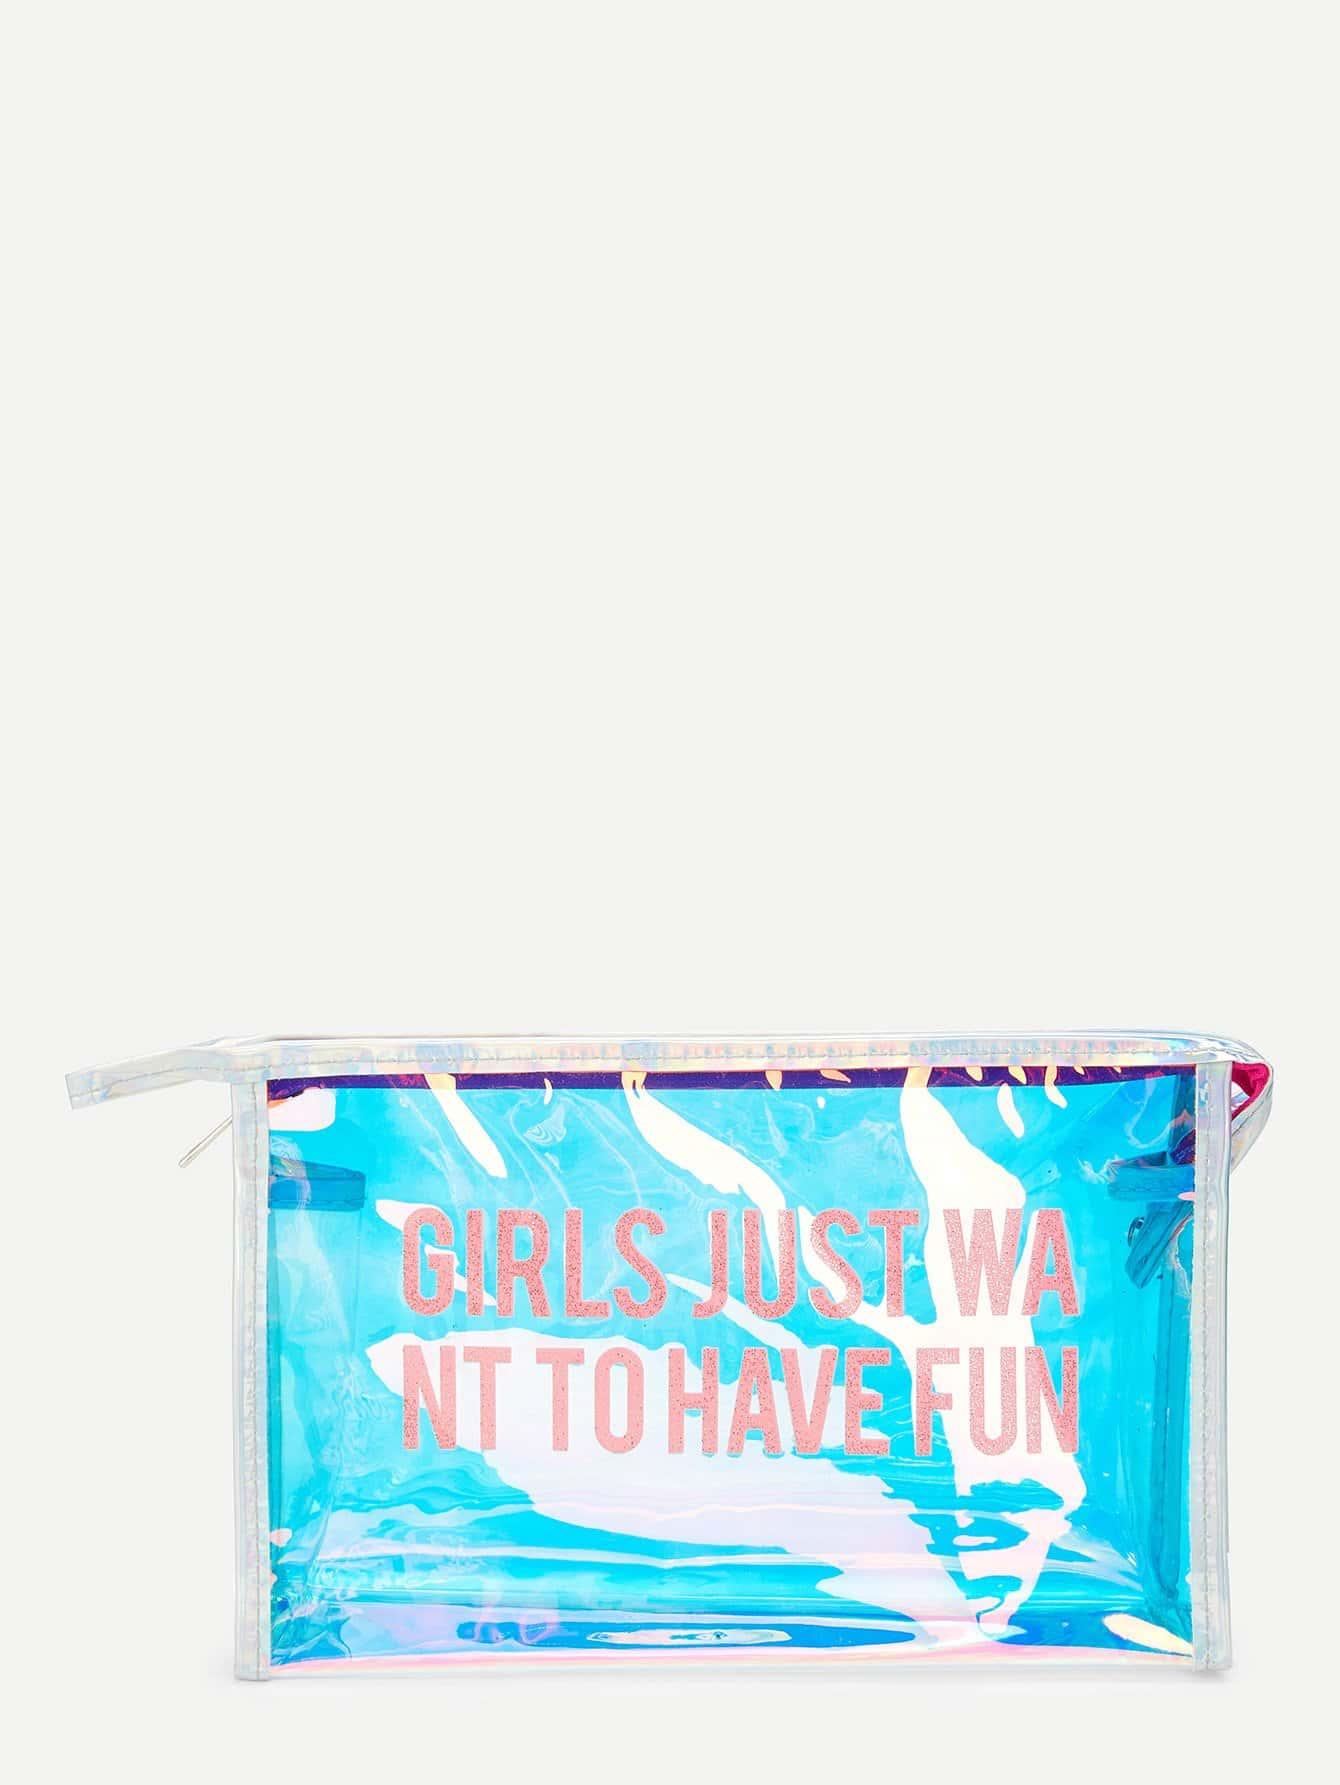 Iridescence PVC Makeup Bag makeup organizer travel bag women cosmetic bags summer dumpling clutch women packages waterproof cosmetic bag handbag